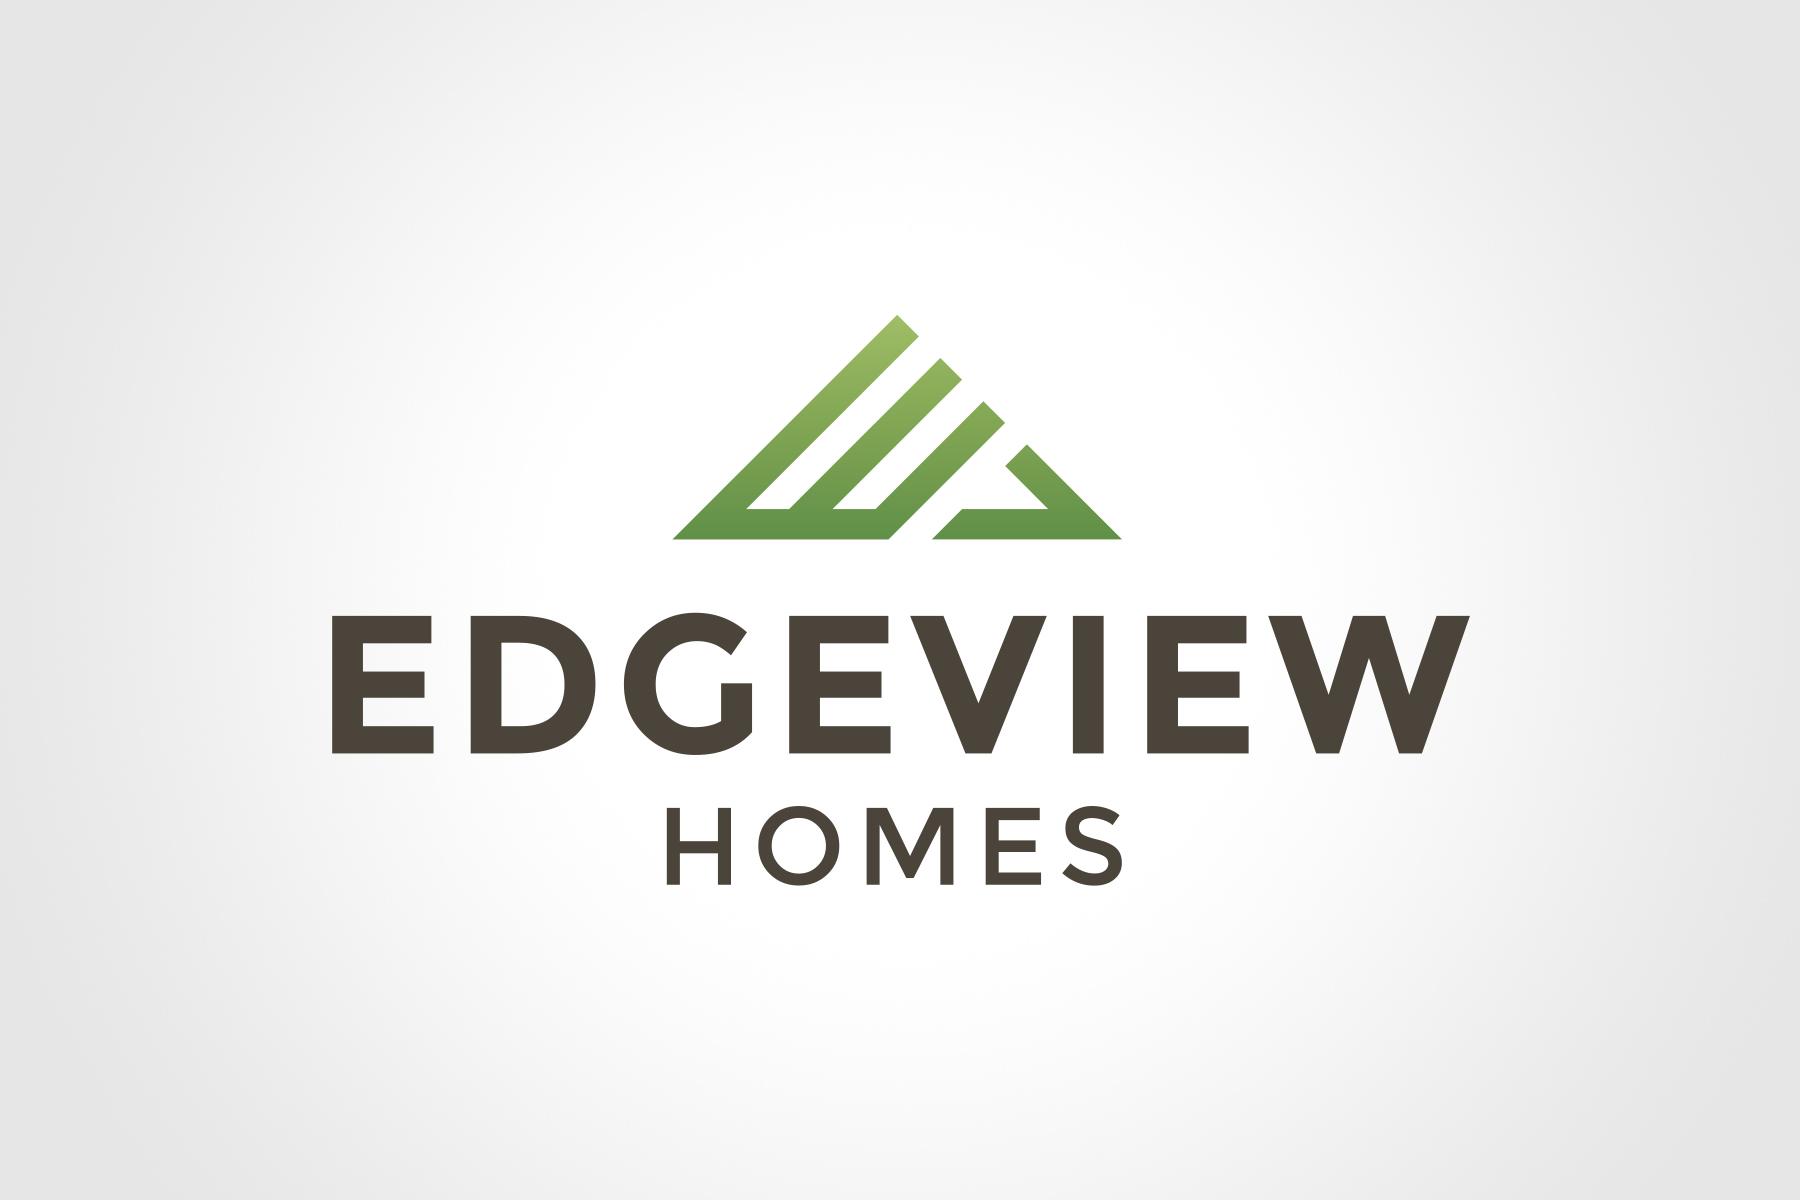 Natasia Designs Edmonton Graphic Designer Logo Design Branding and Brand Development Alberta Construction and Home Builder Architect Edgeview Homes